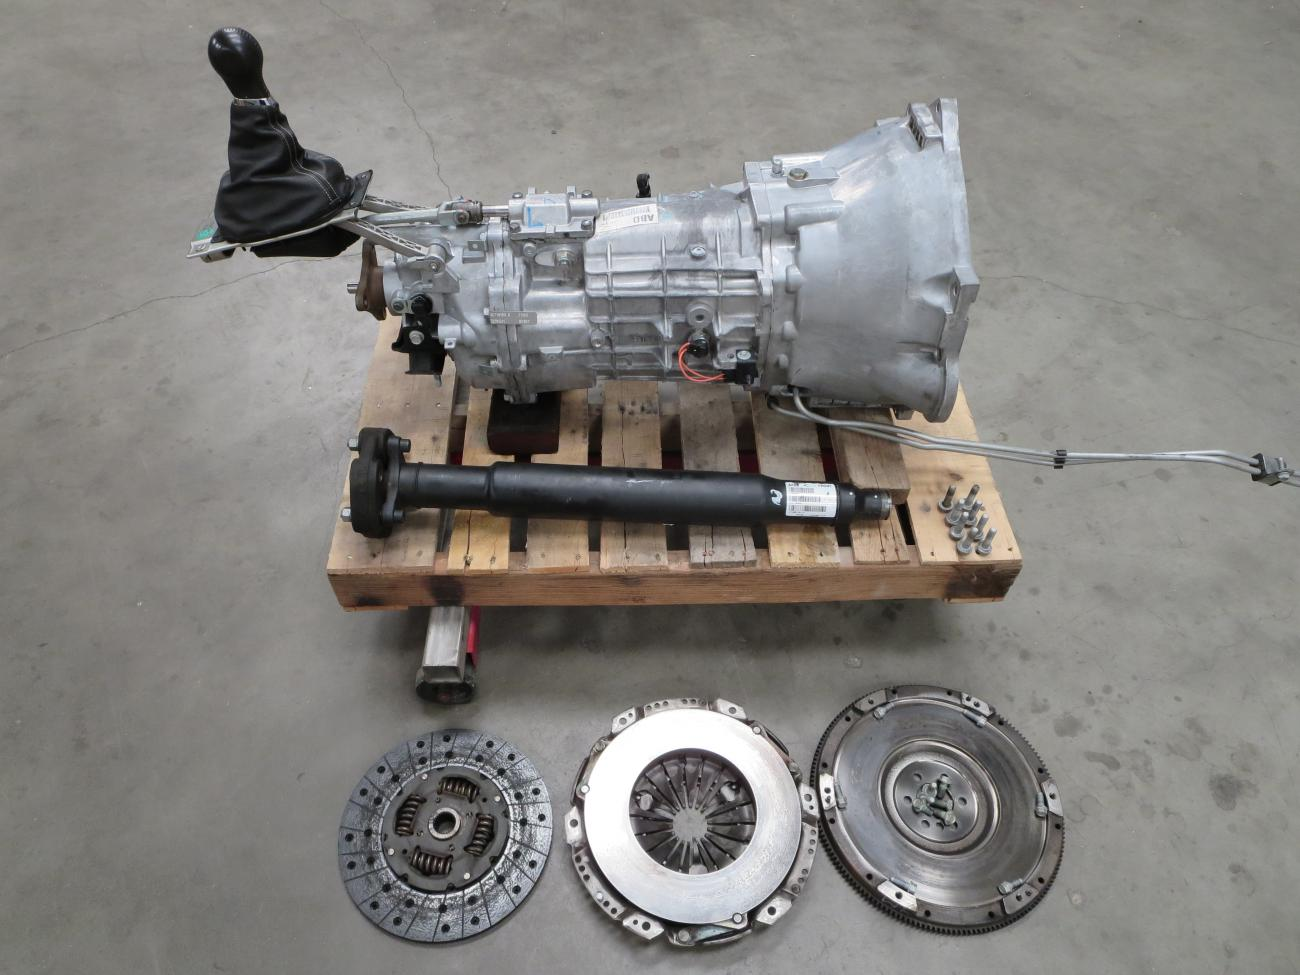 Camaro chevy camaro 5 speed manual transmission : TR6060 6 Speed Manual Swap - Camaro5 Chevy Camaro Forum / Camaro ...